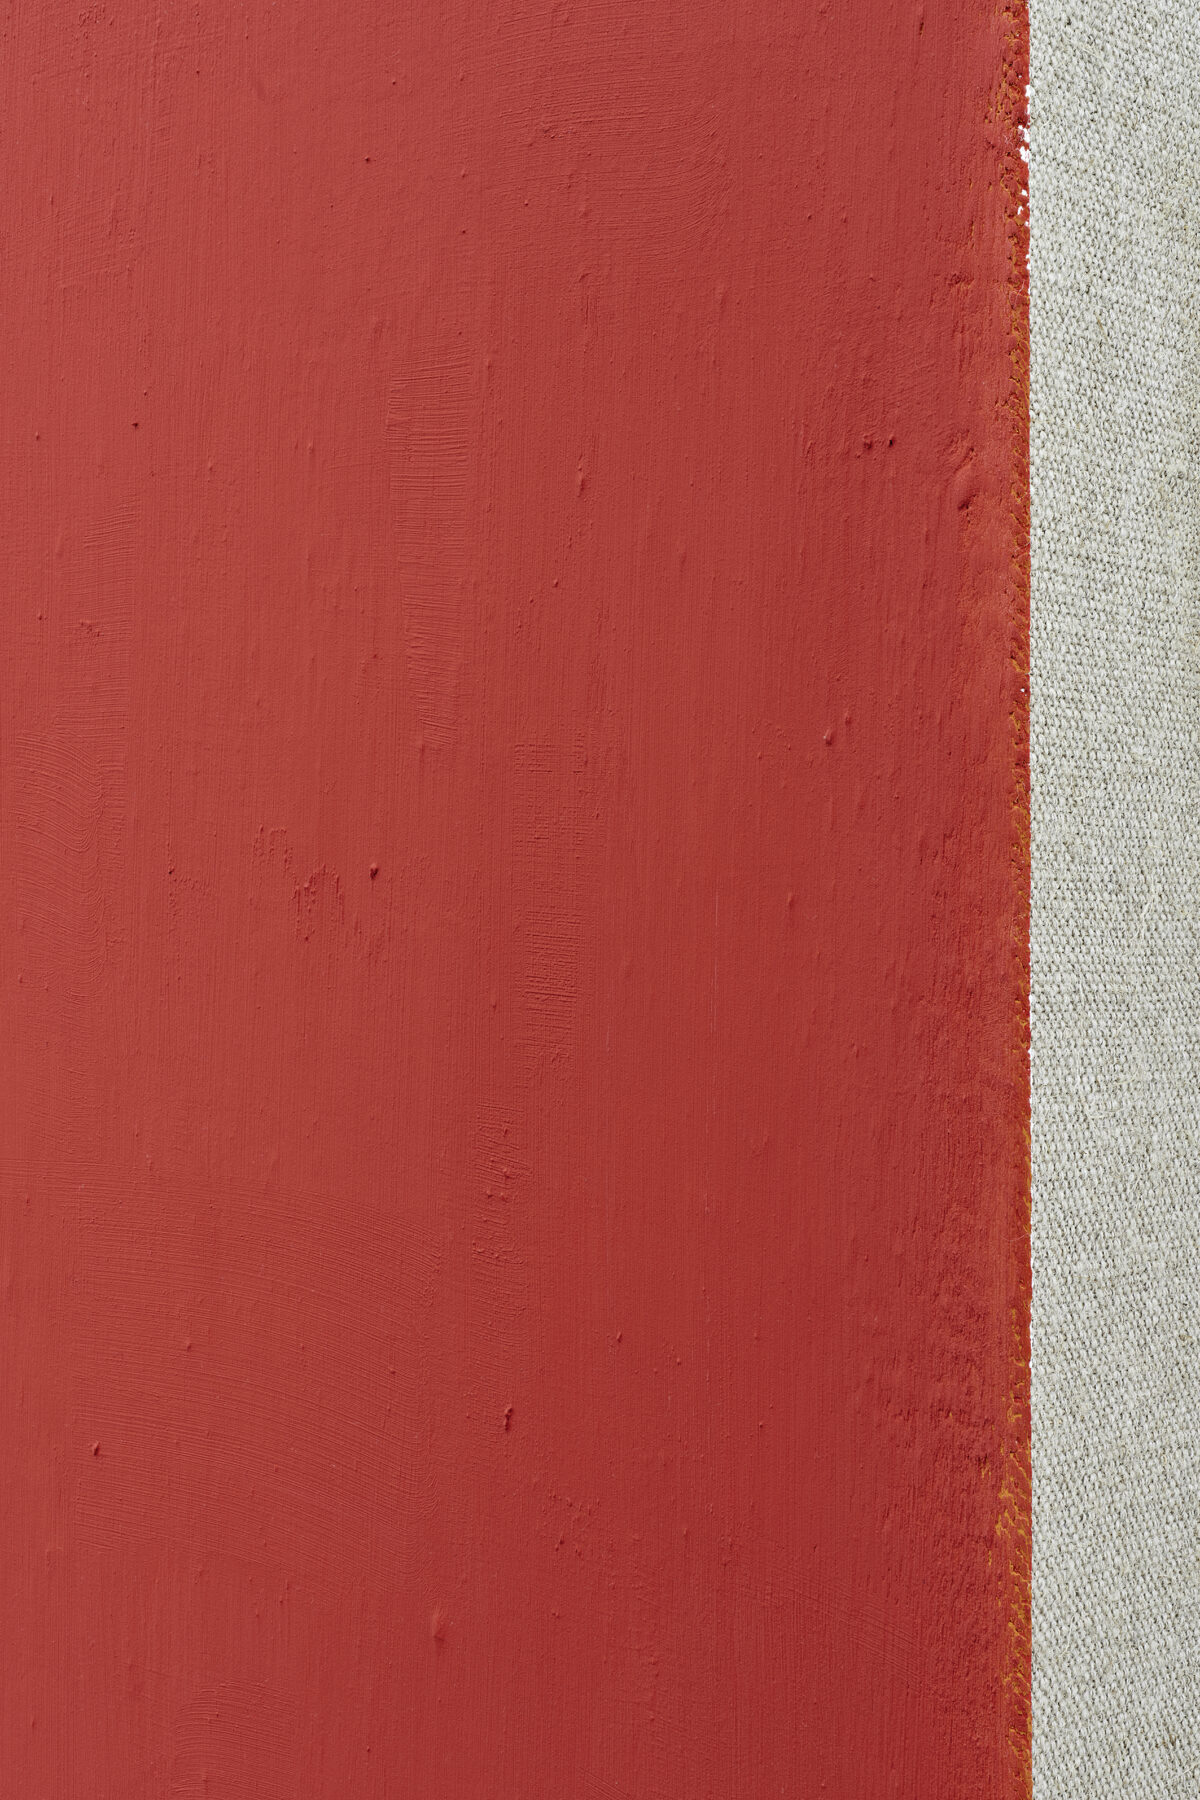 Phil Sims, Cat. 420 (orange/red) (Detail), 2000,  Öl auf Leinwand, 153 x 128 cm. Courtesy Paul Ege Art Collection